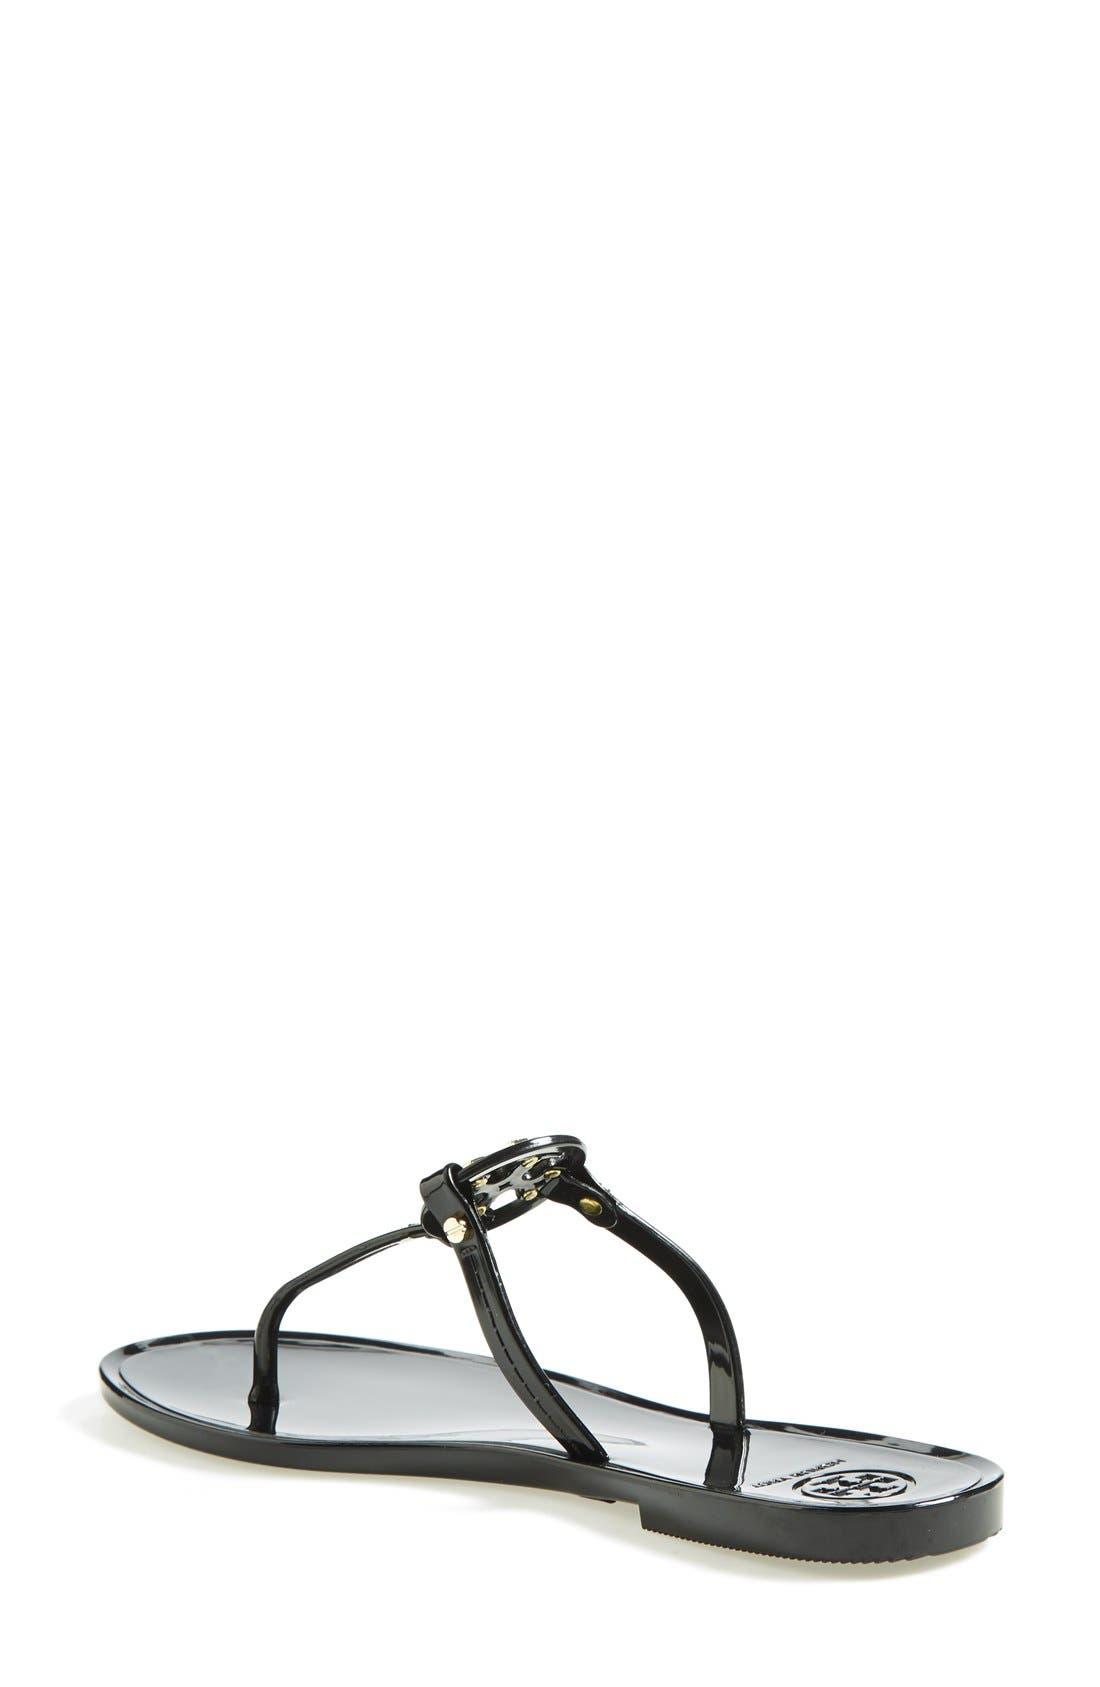 Alternate Image 2  - Tory Burch 'Mini Miller' Flat Sandal (Women)